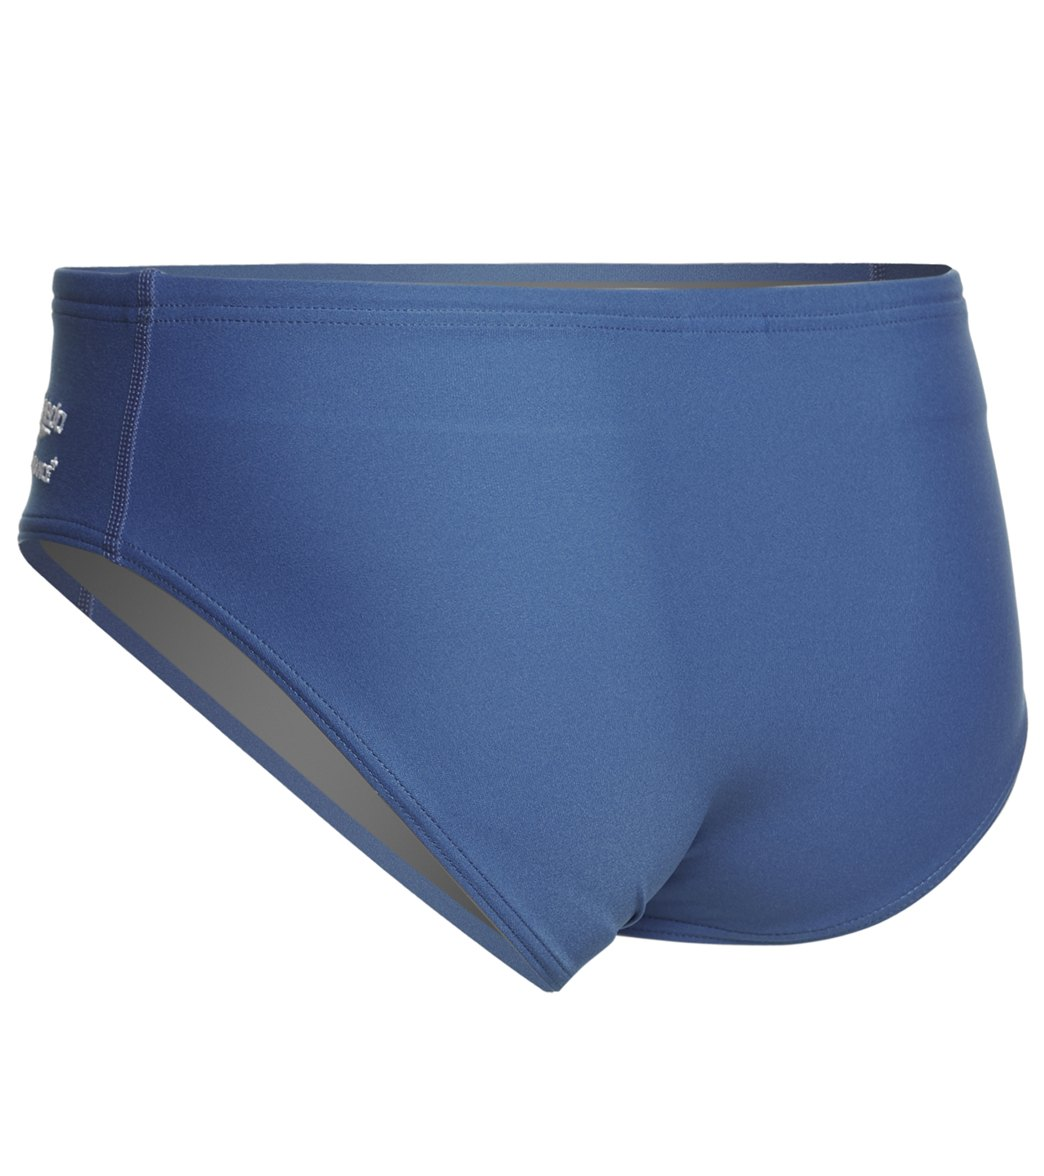 b1c78d5053380 Speedo Solid Endurance Brief Swimsuit at SwimOutlet.com